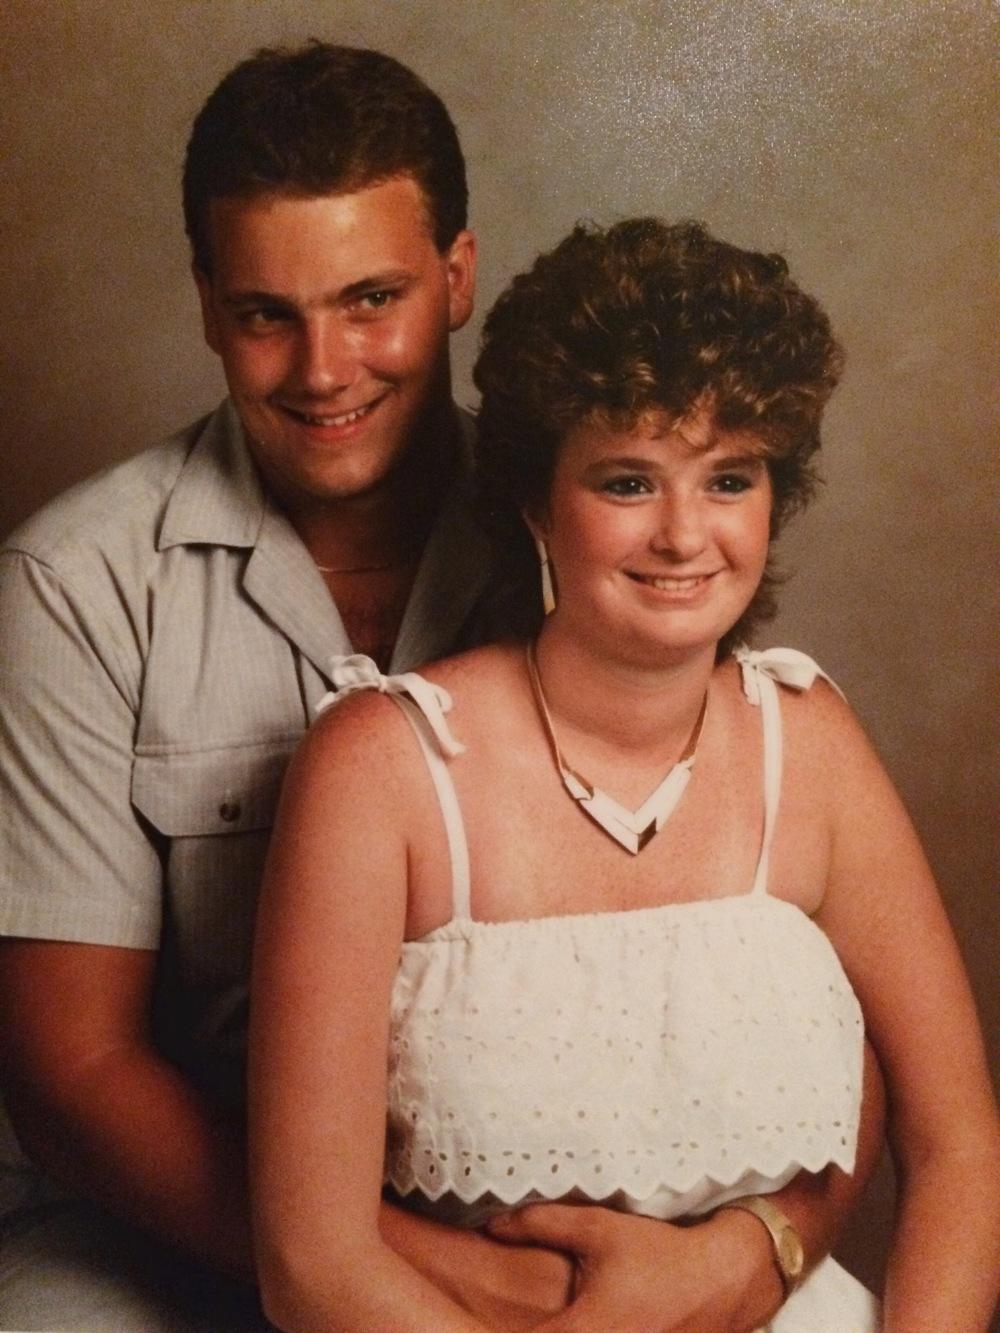 Joe and Kim's engagement photo 1987